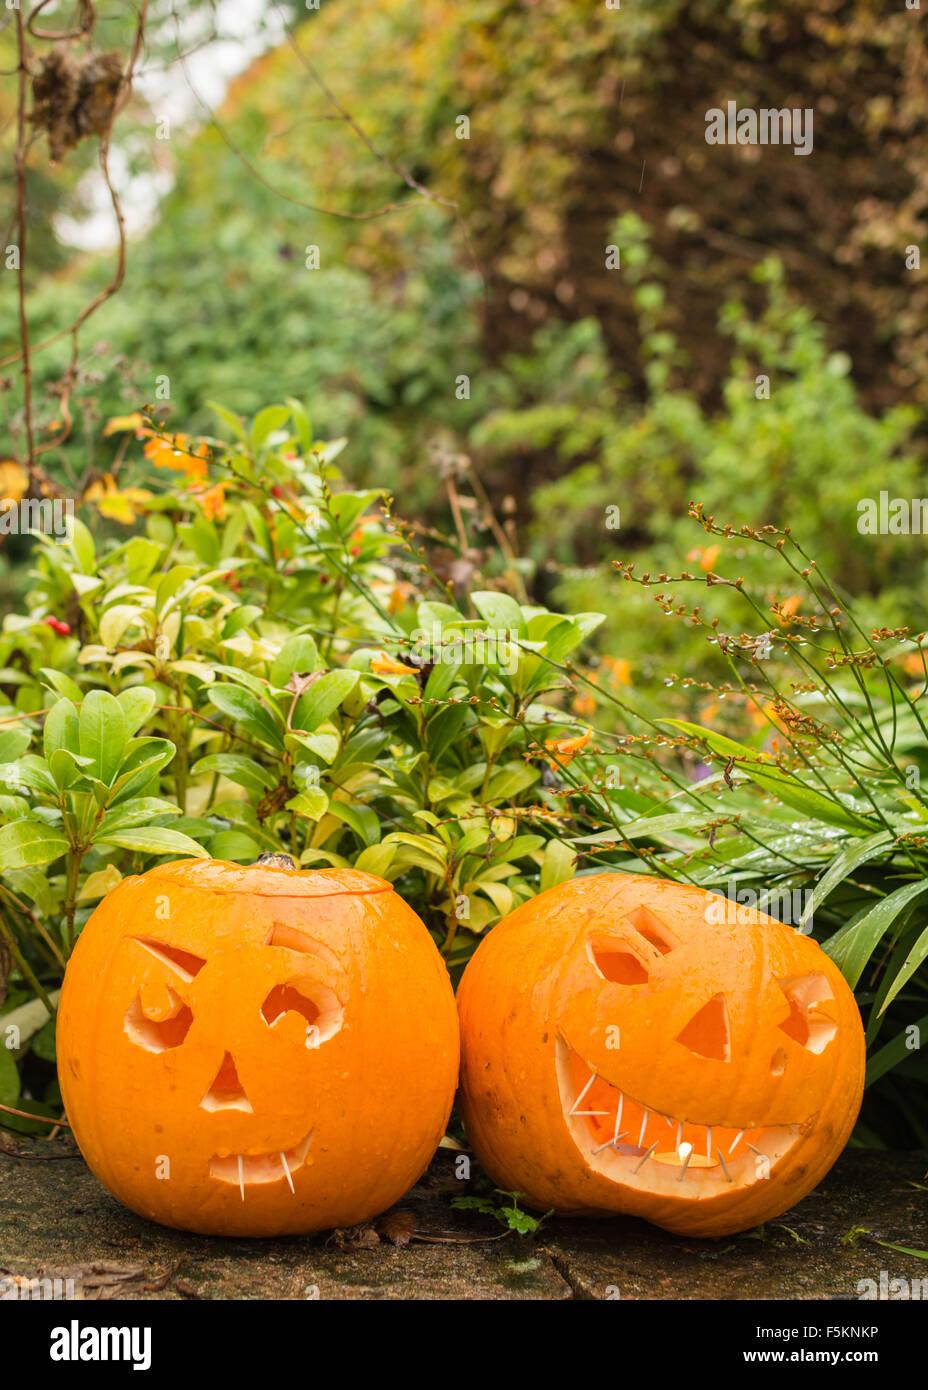 two carved halloween pumpkins in autumn garden - uk - Stock Image